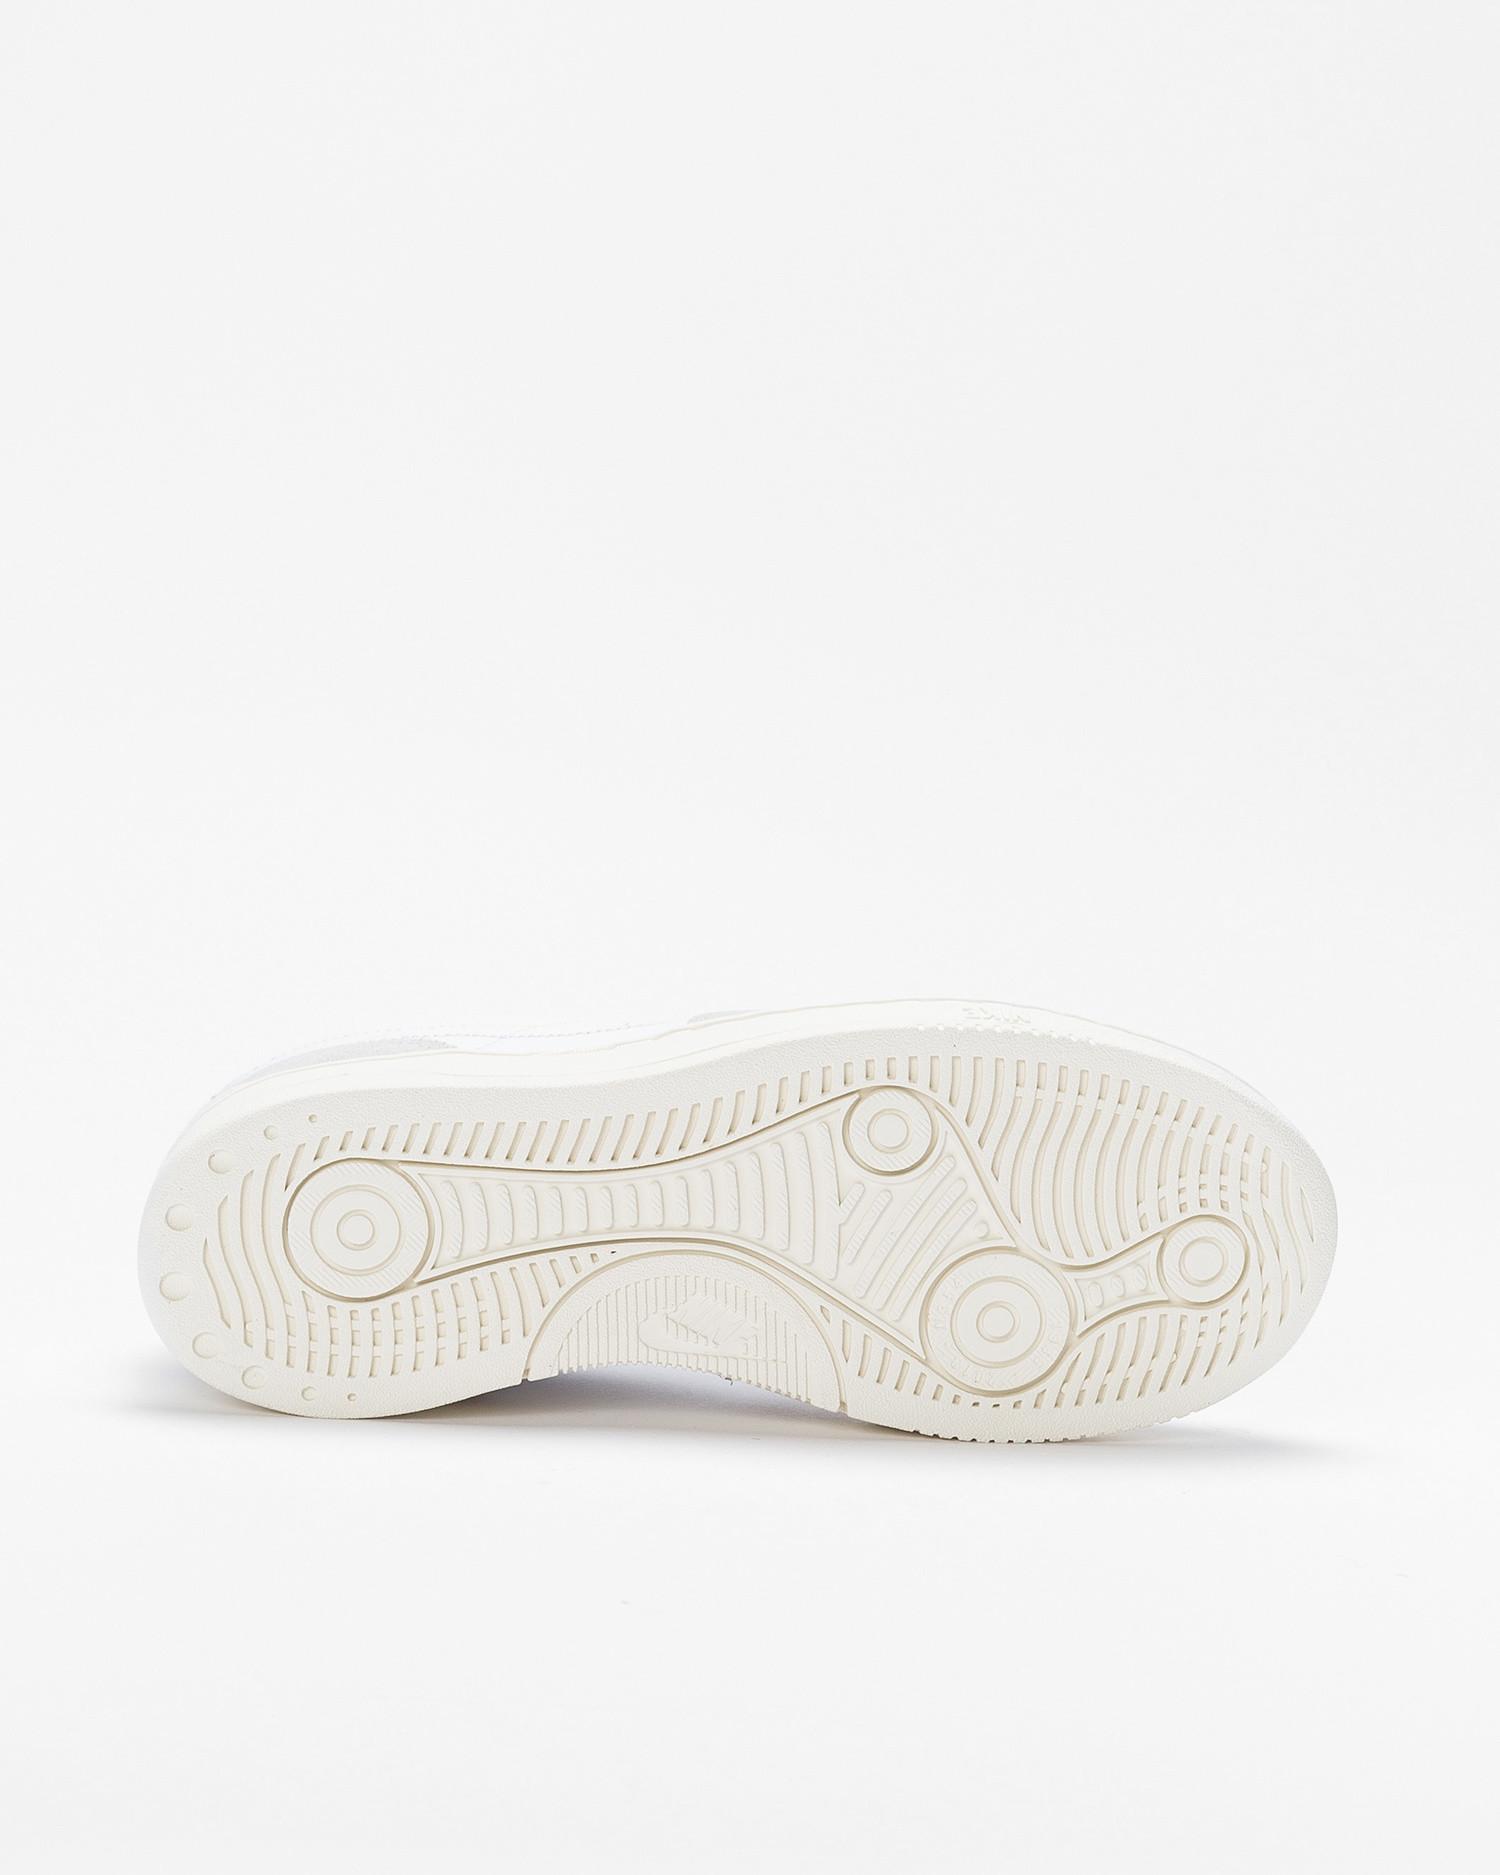 Nike Squash-Type White/White-Platinum Tint-Sail